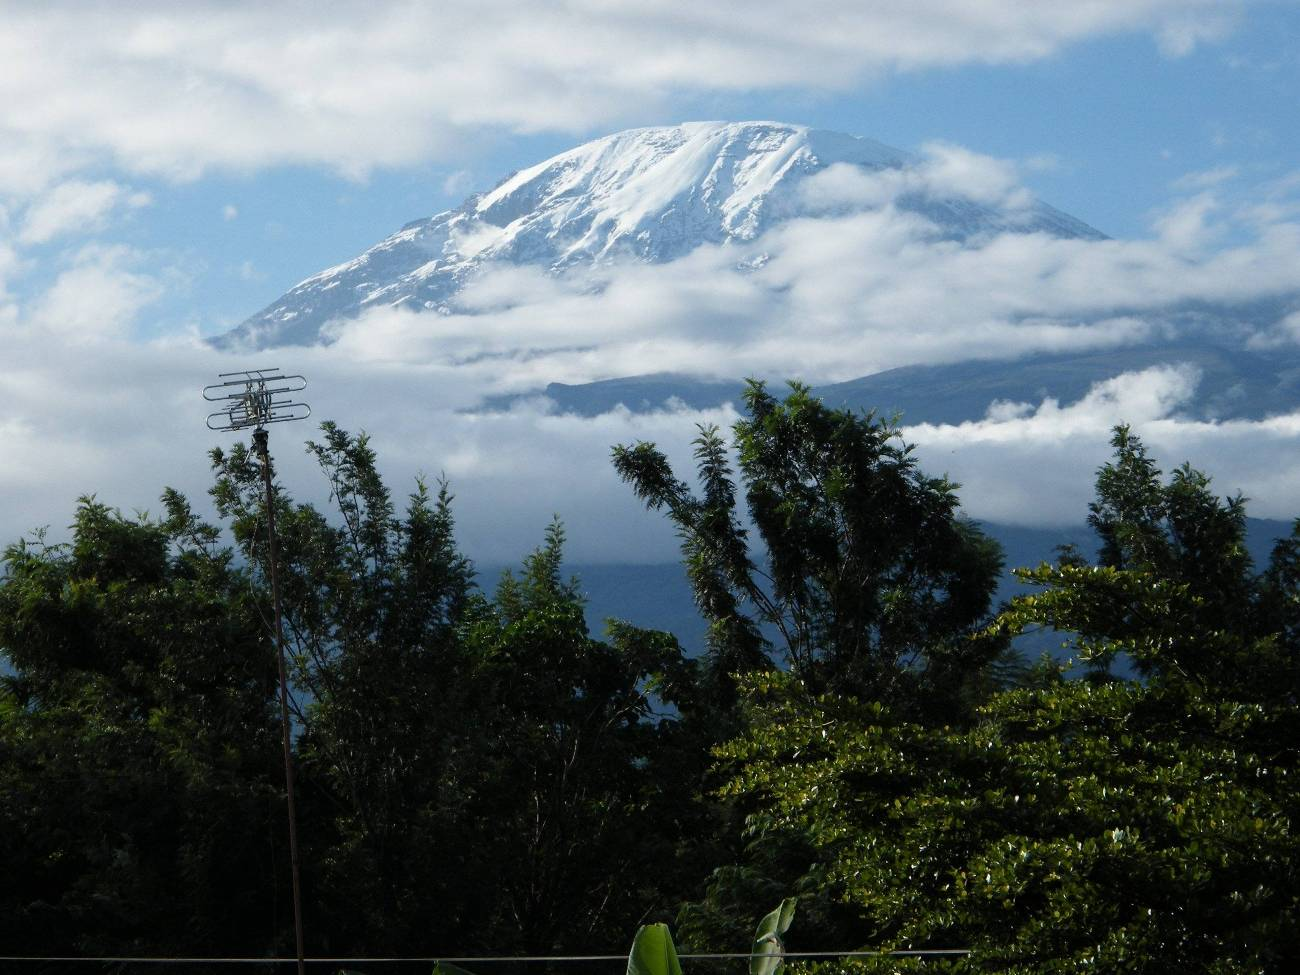 Guided Tours Of Kilimanjaro